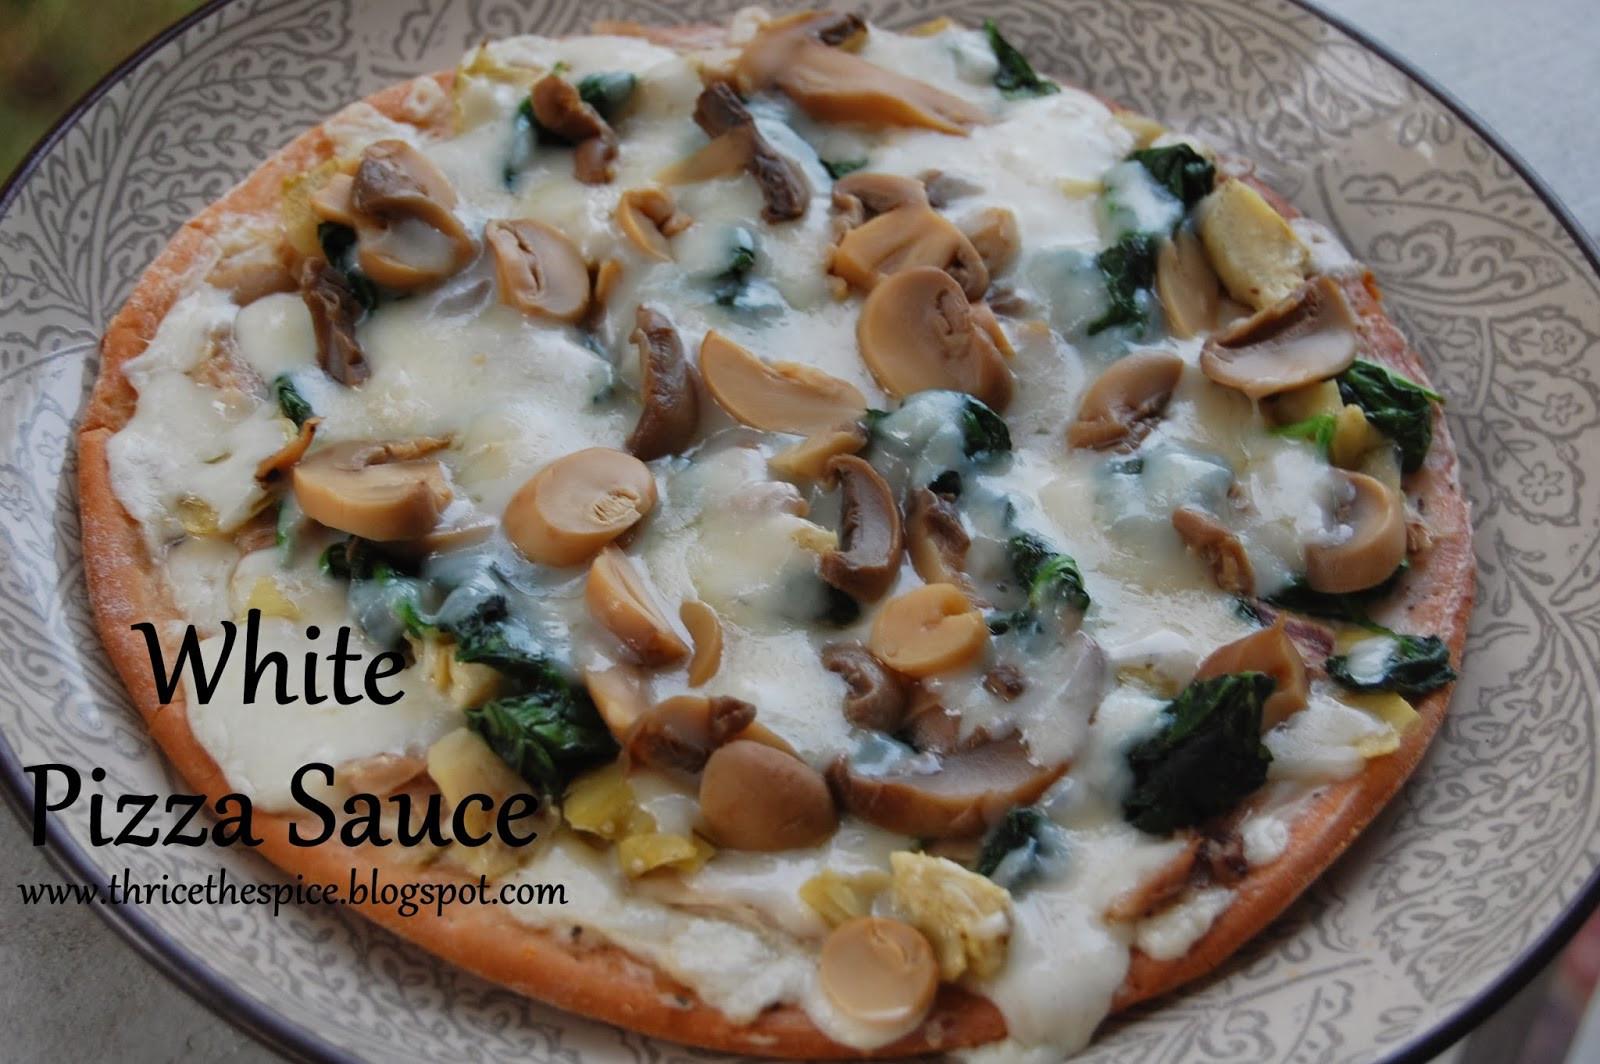 White Pizza Sauce Recipe  ThriceTheSpice White Pizza Sauce